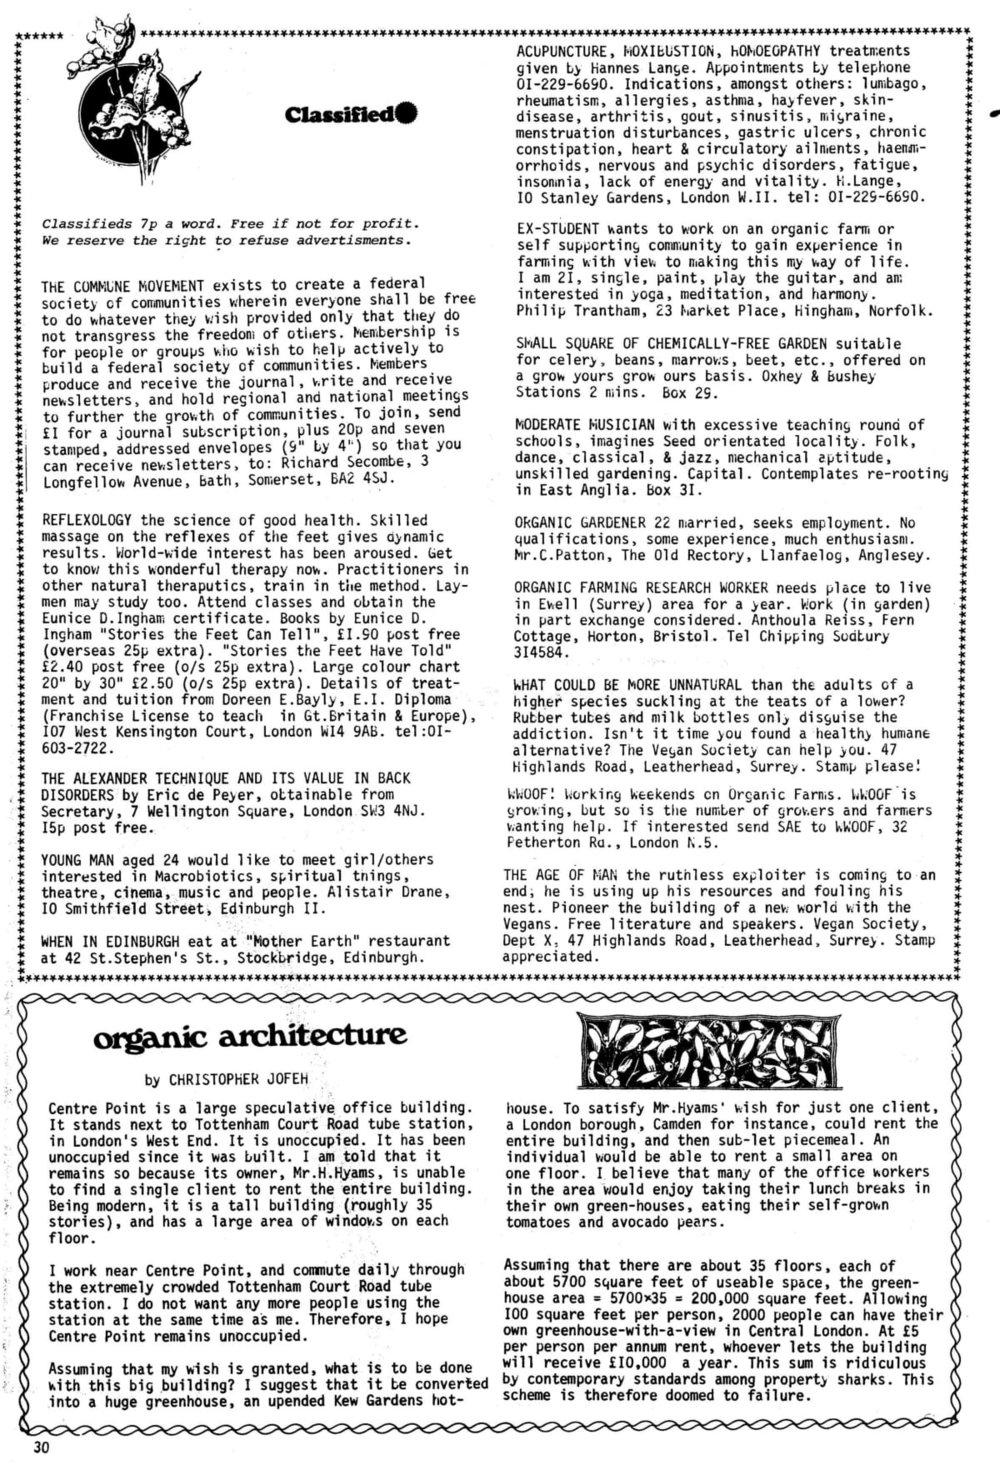 seed-v2-n11-nov1973-30.jpg